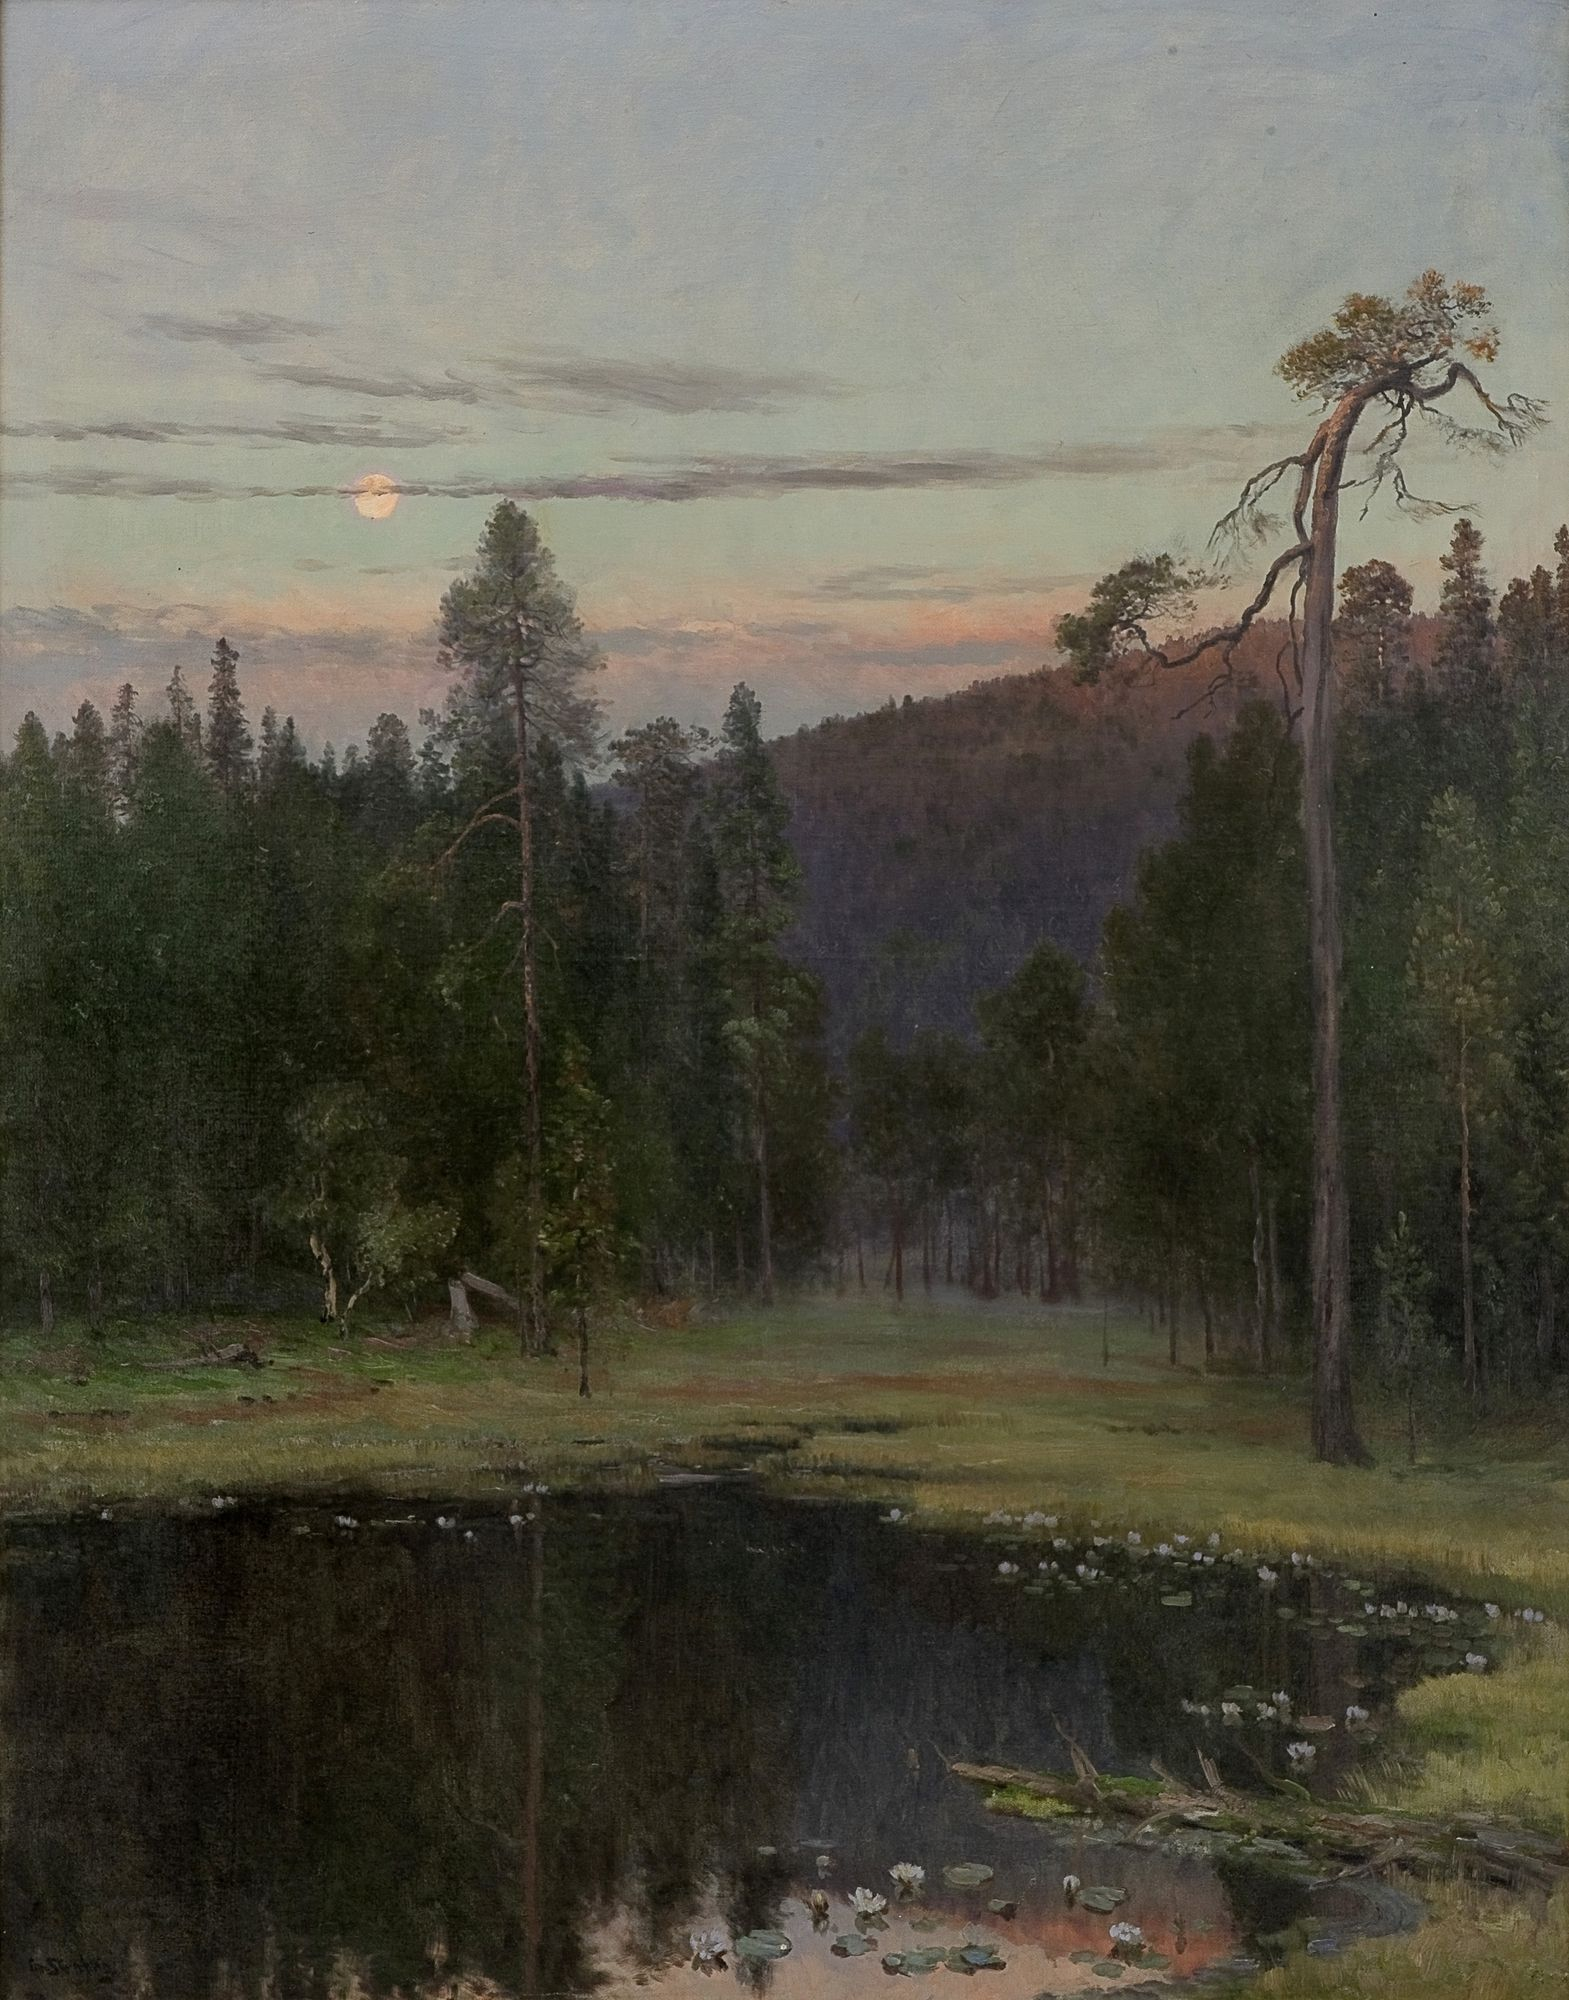 Skredsvig, Christian (1854-1924) ''Evening by a pond''